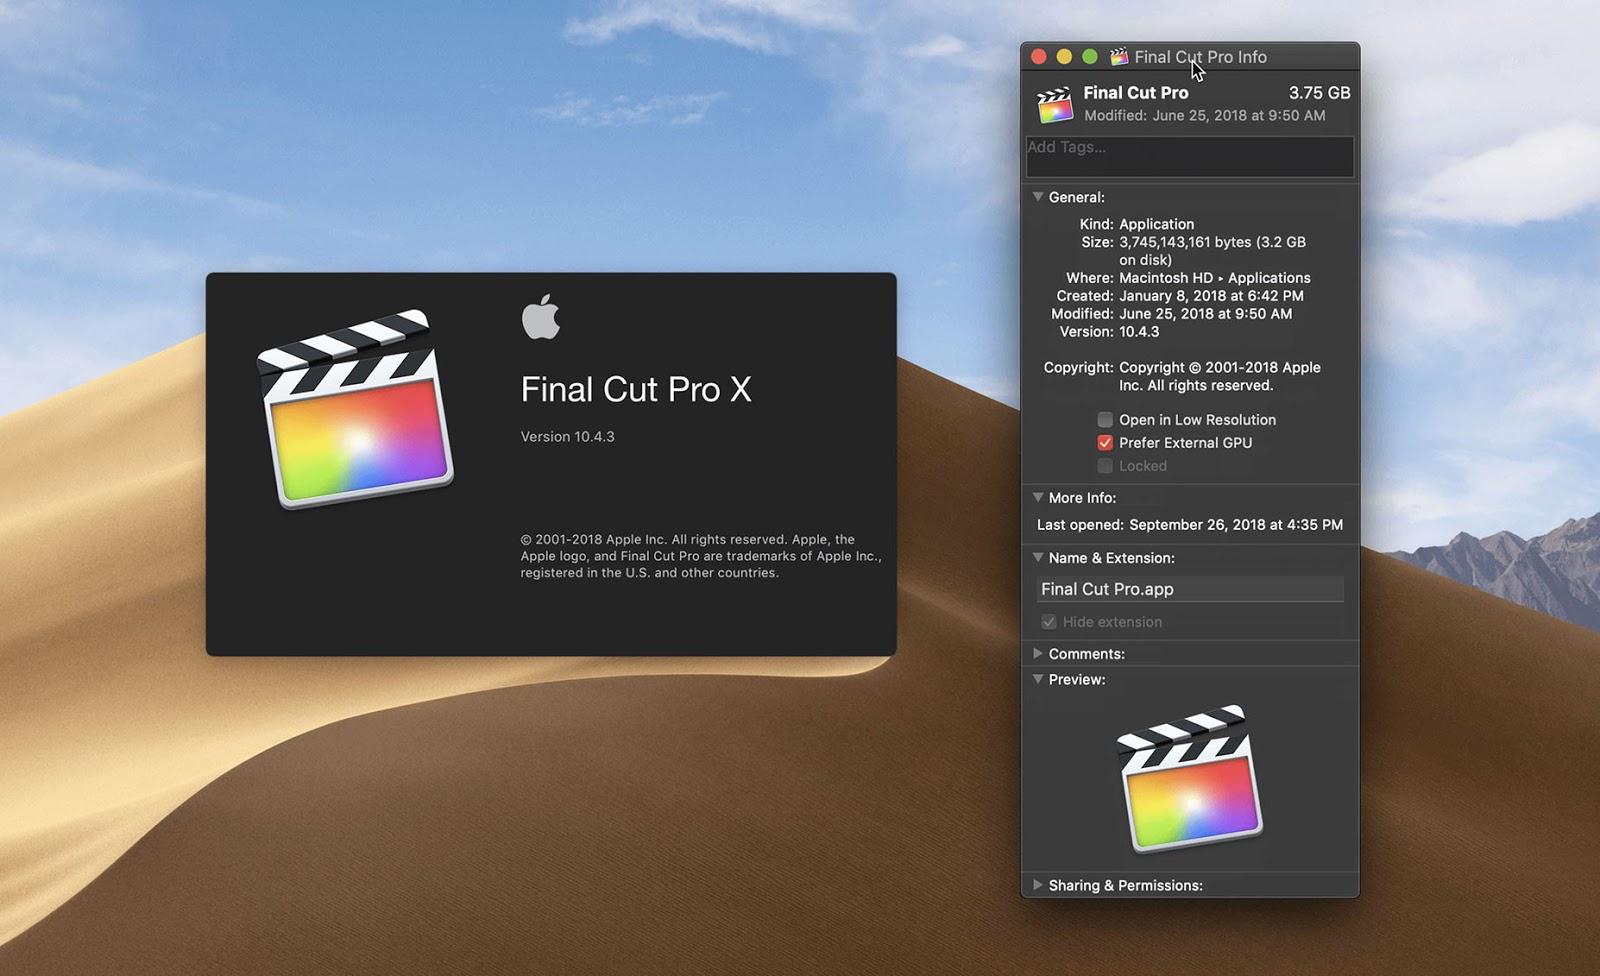 Mojave 讓 Final Cut Pro X 支援外接 eGPU 顯卡